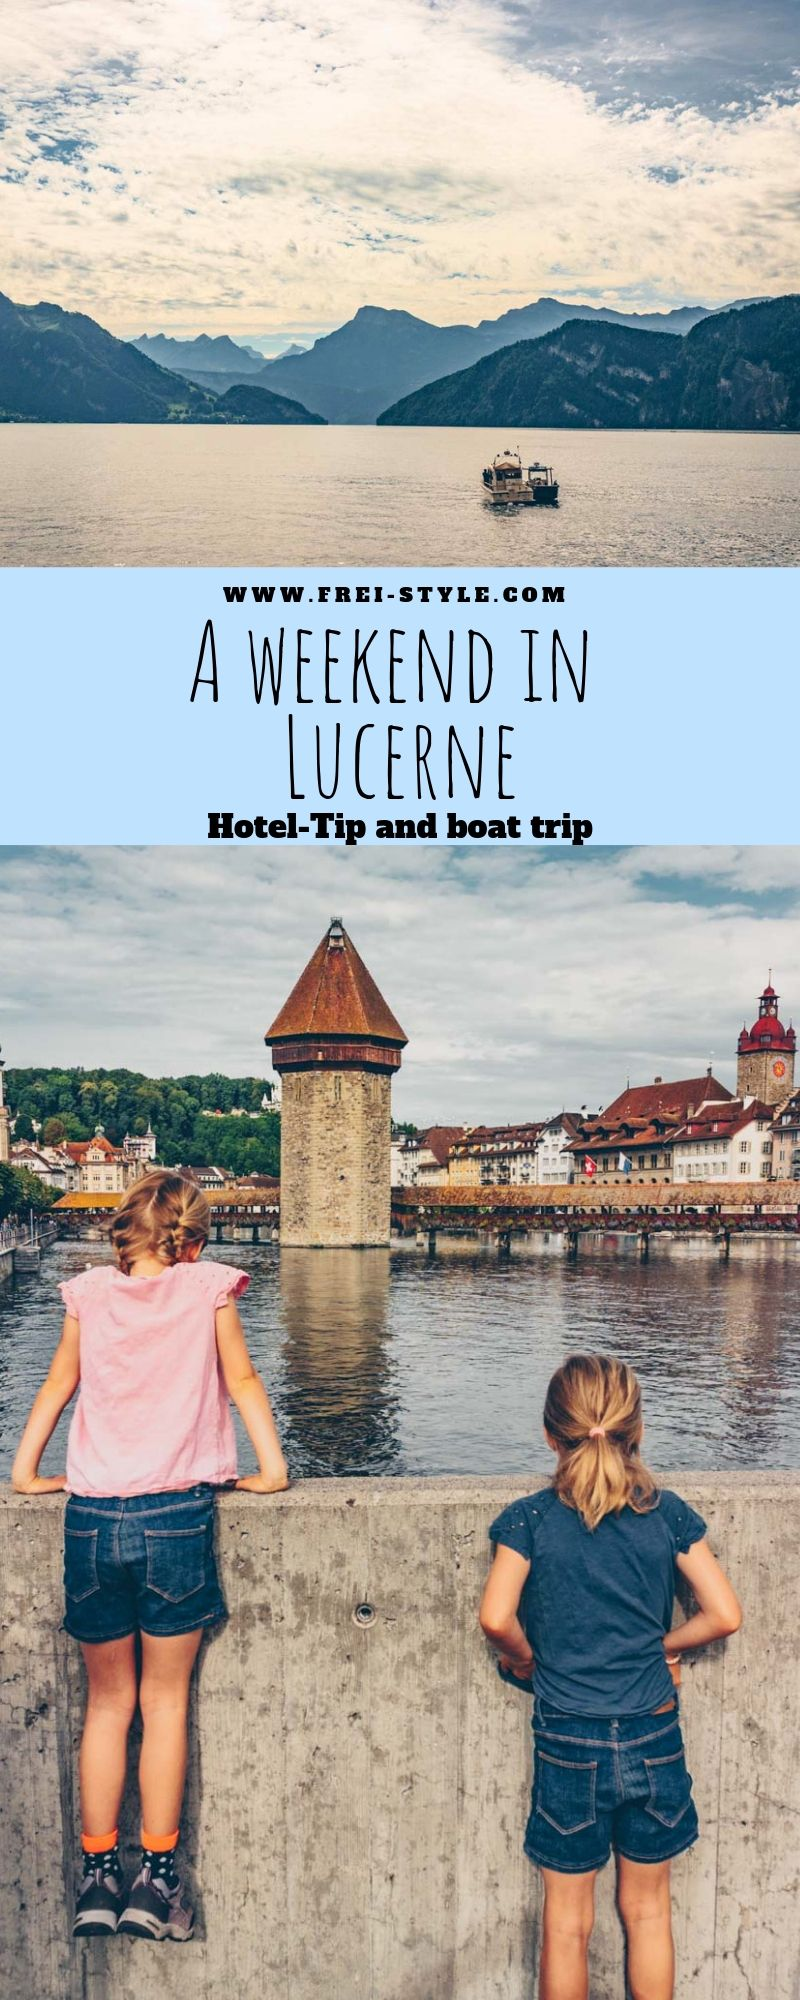 A weekend in Lucerne